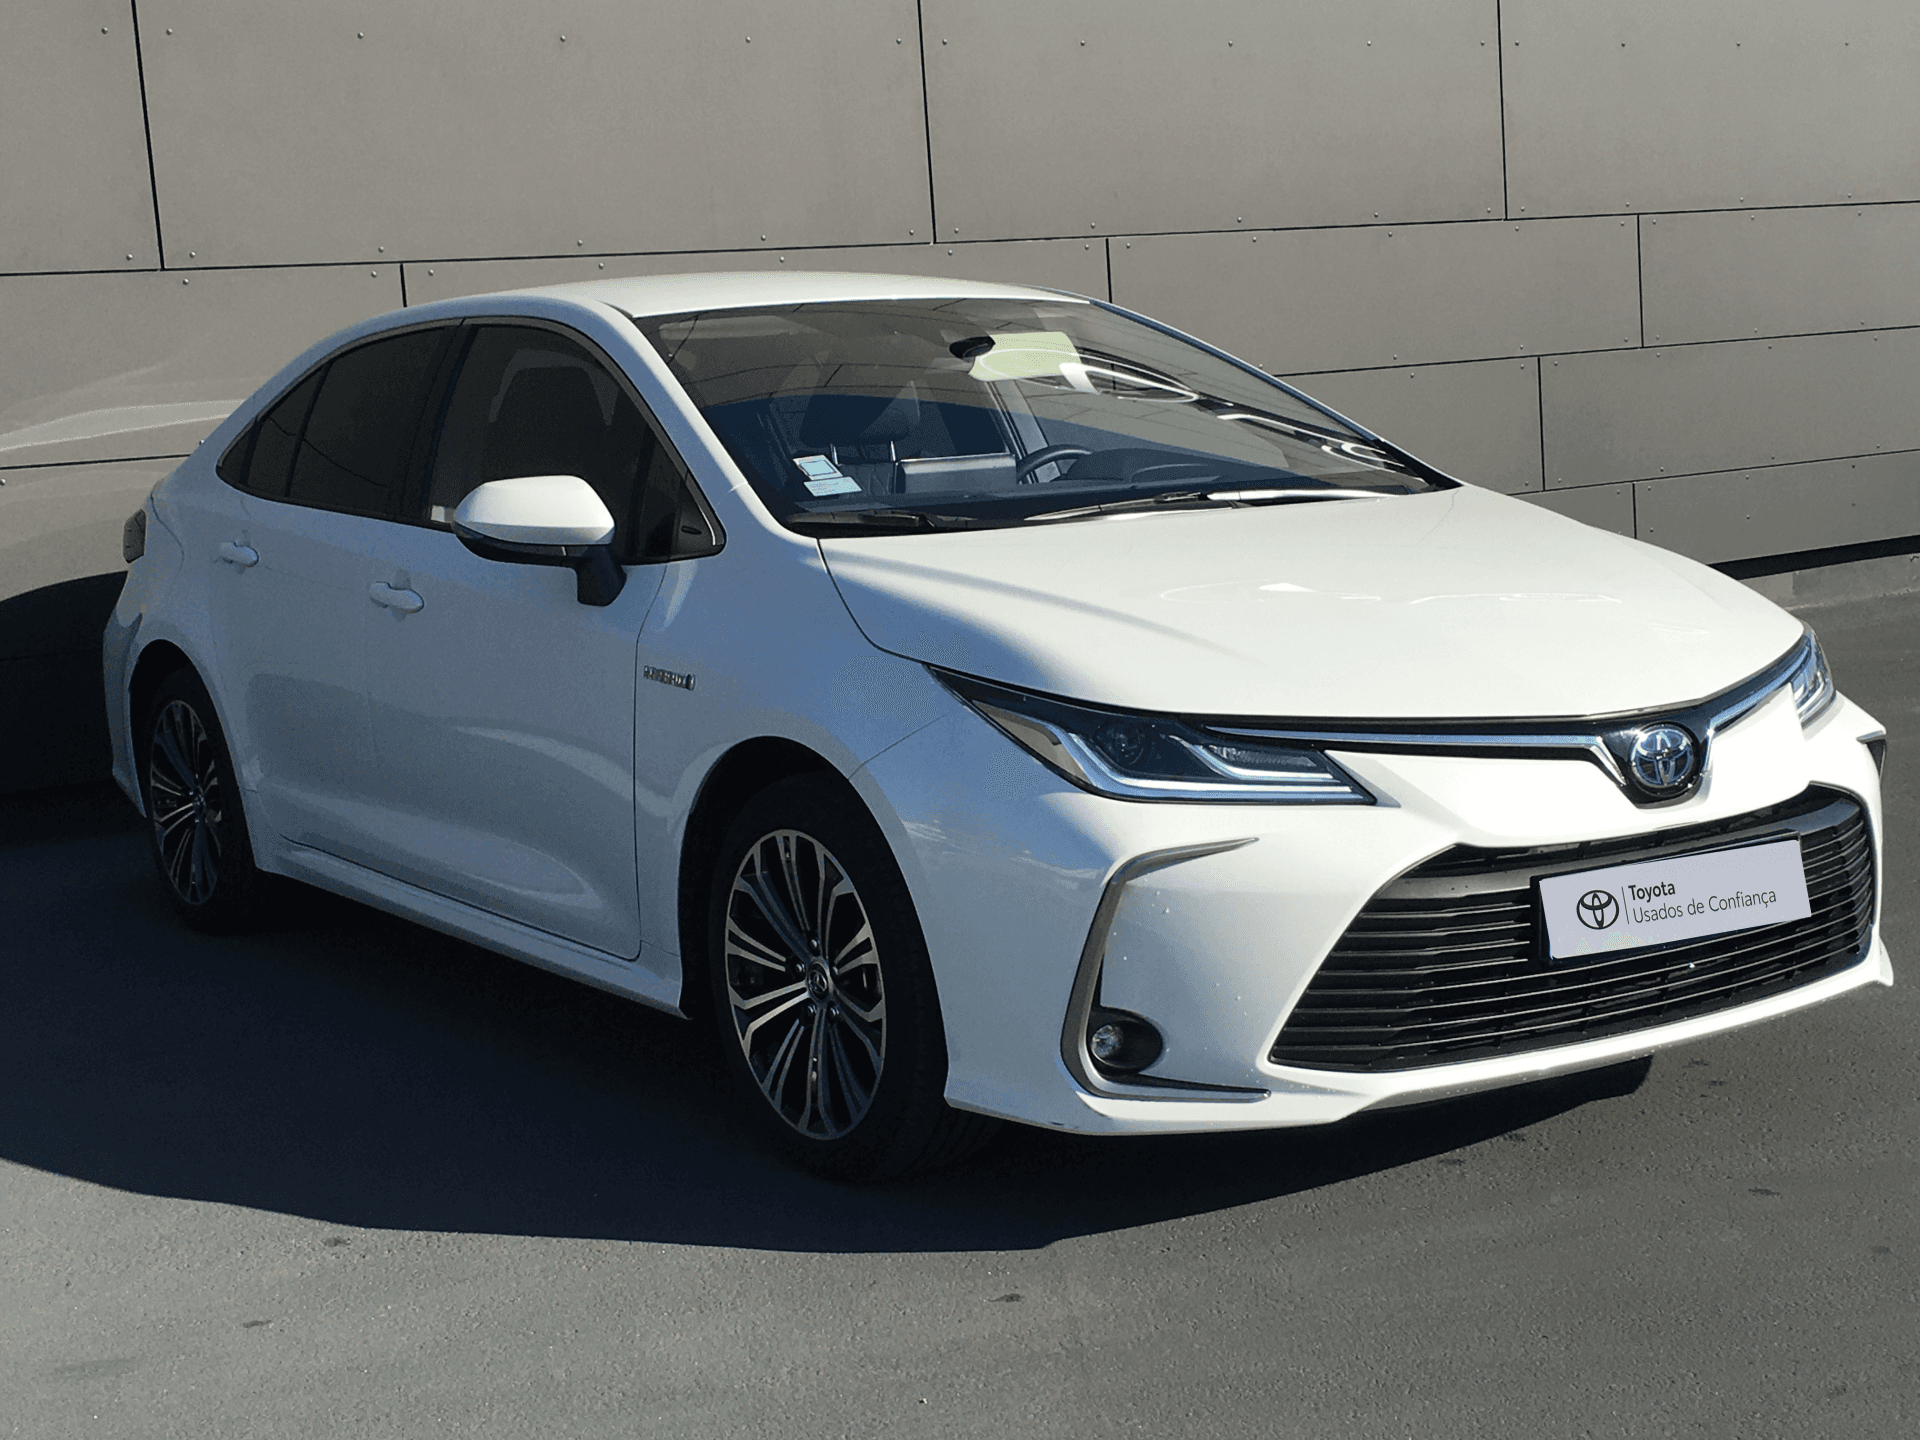 Toyota Corolla 1.8 Hybrid Exclusive + NAVI usada Faro